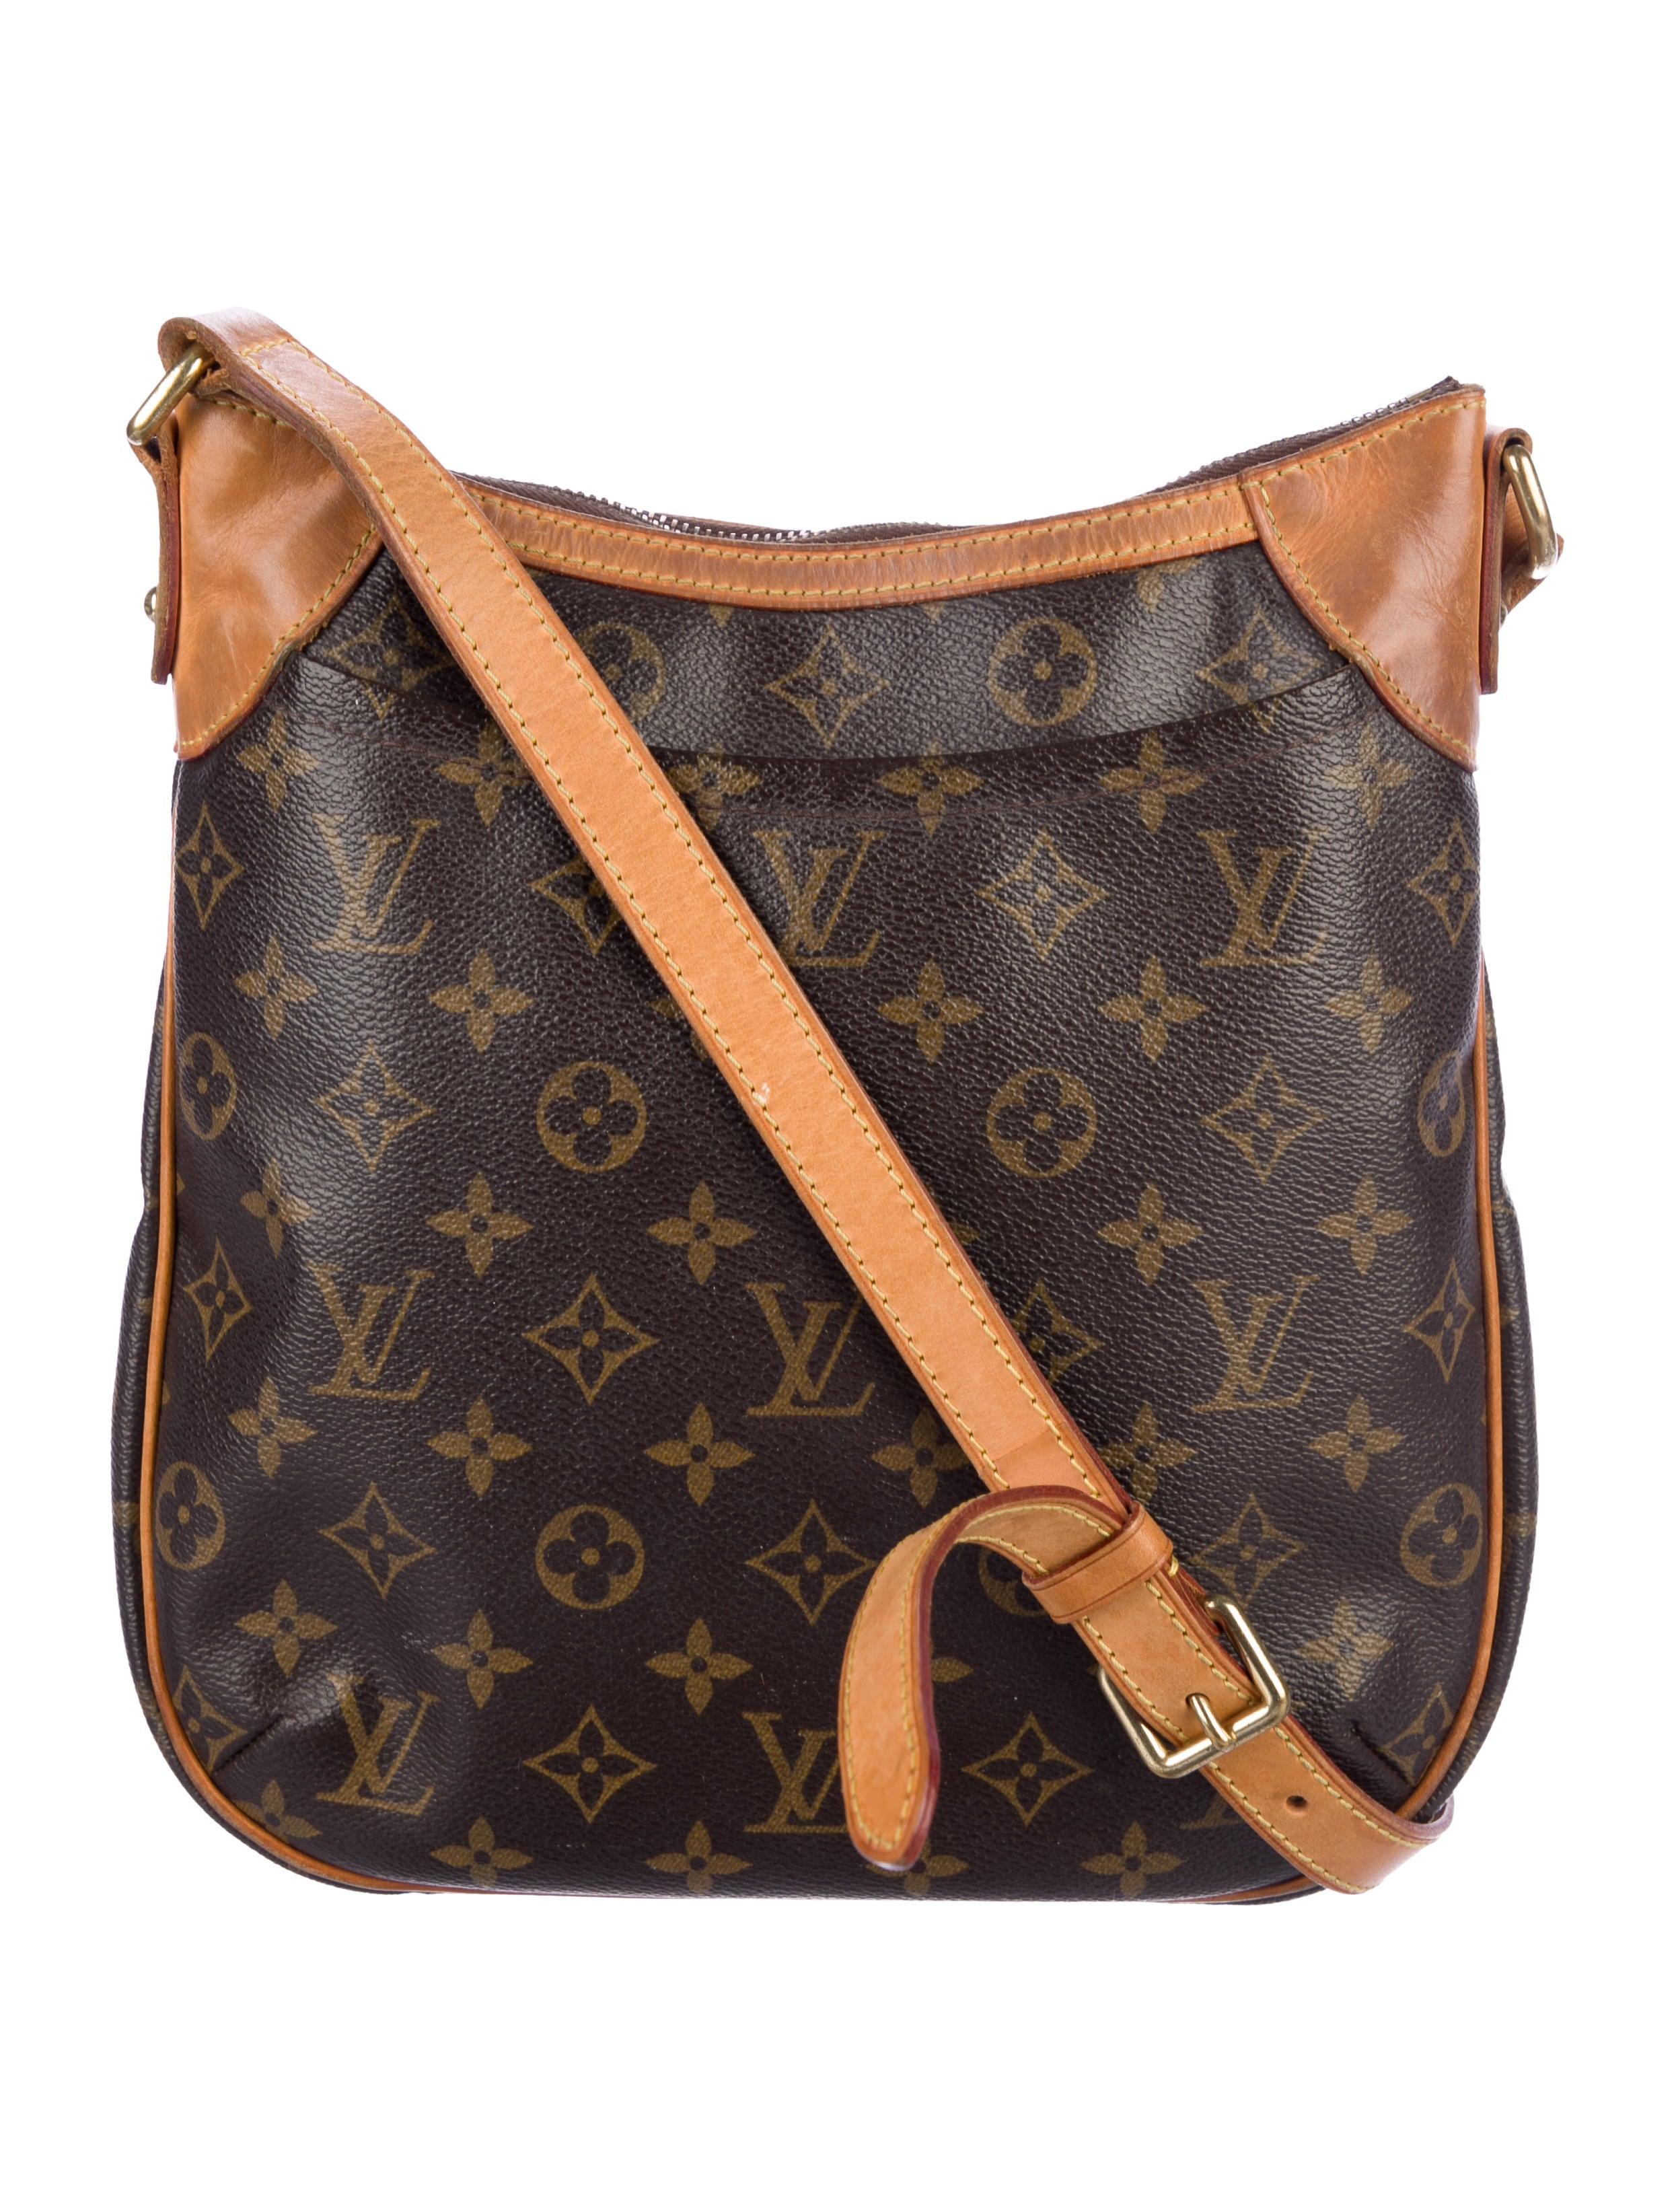 7778f82ab267 Versace Palazzo Empire Original Calfskin Leather Small Tote Bag